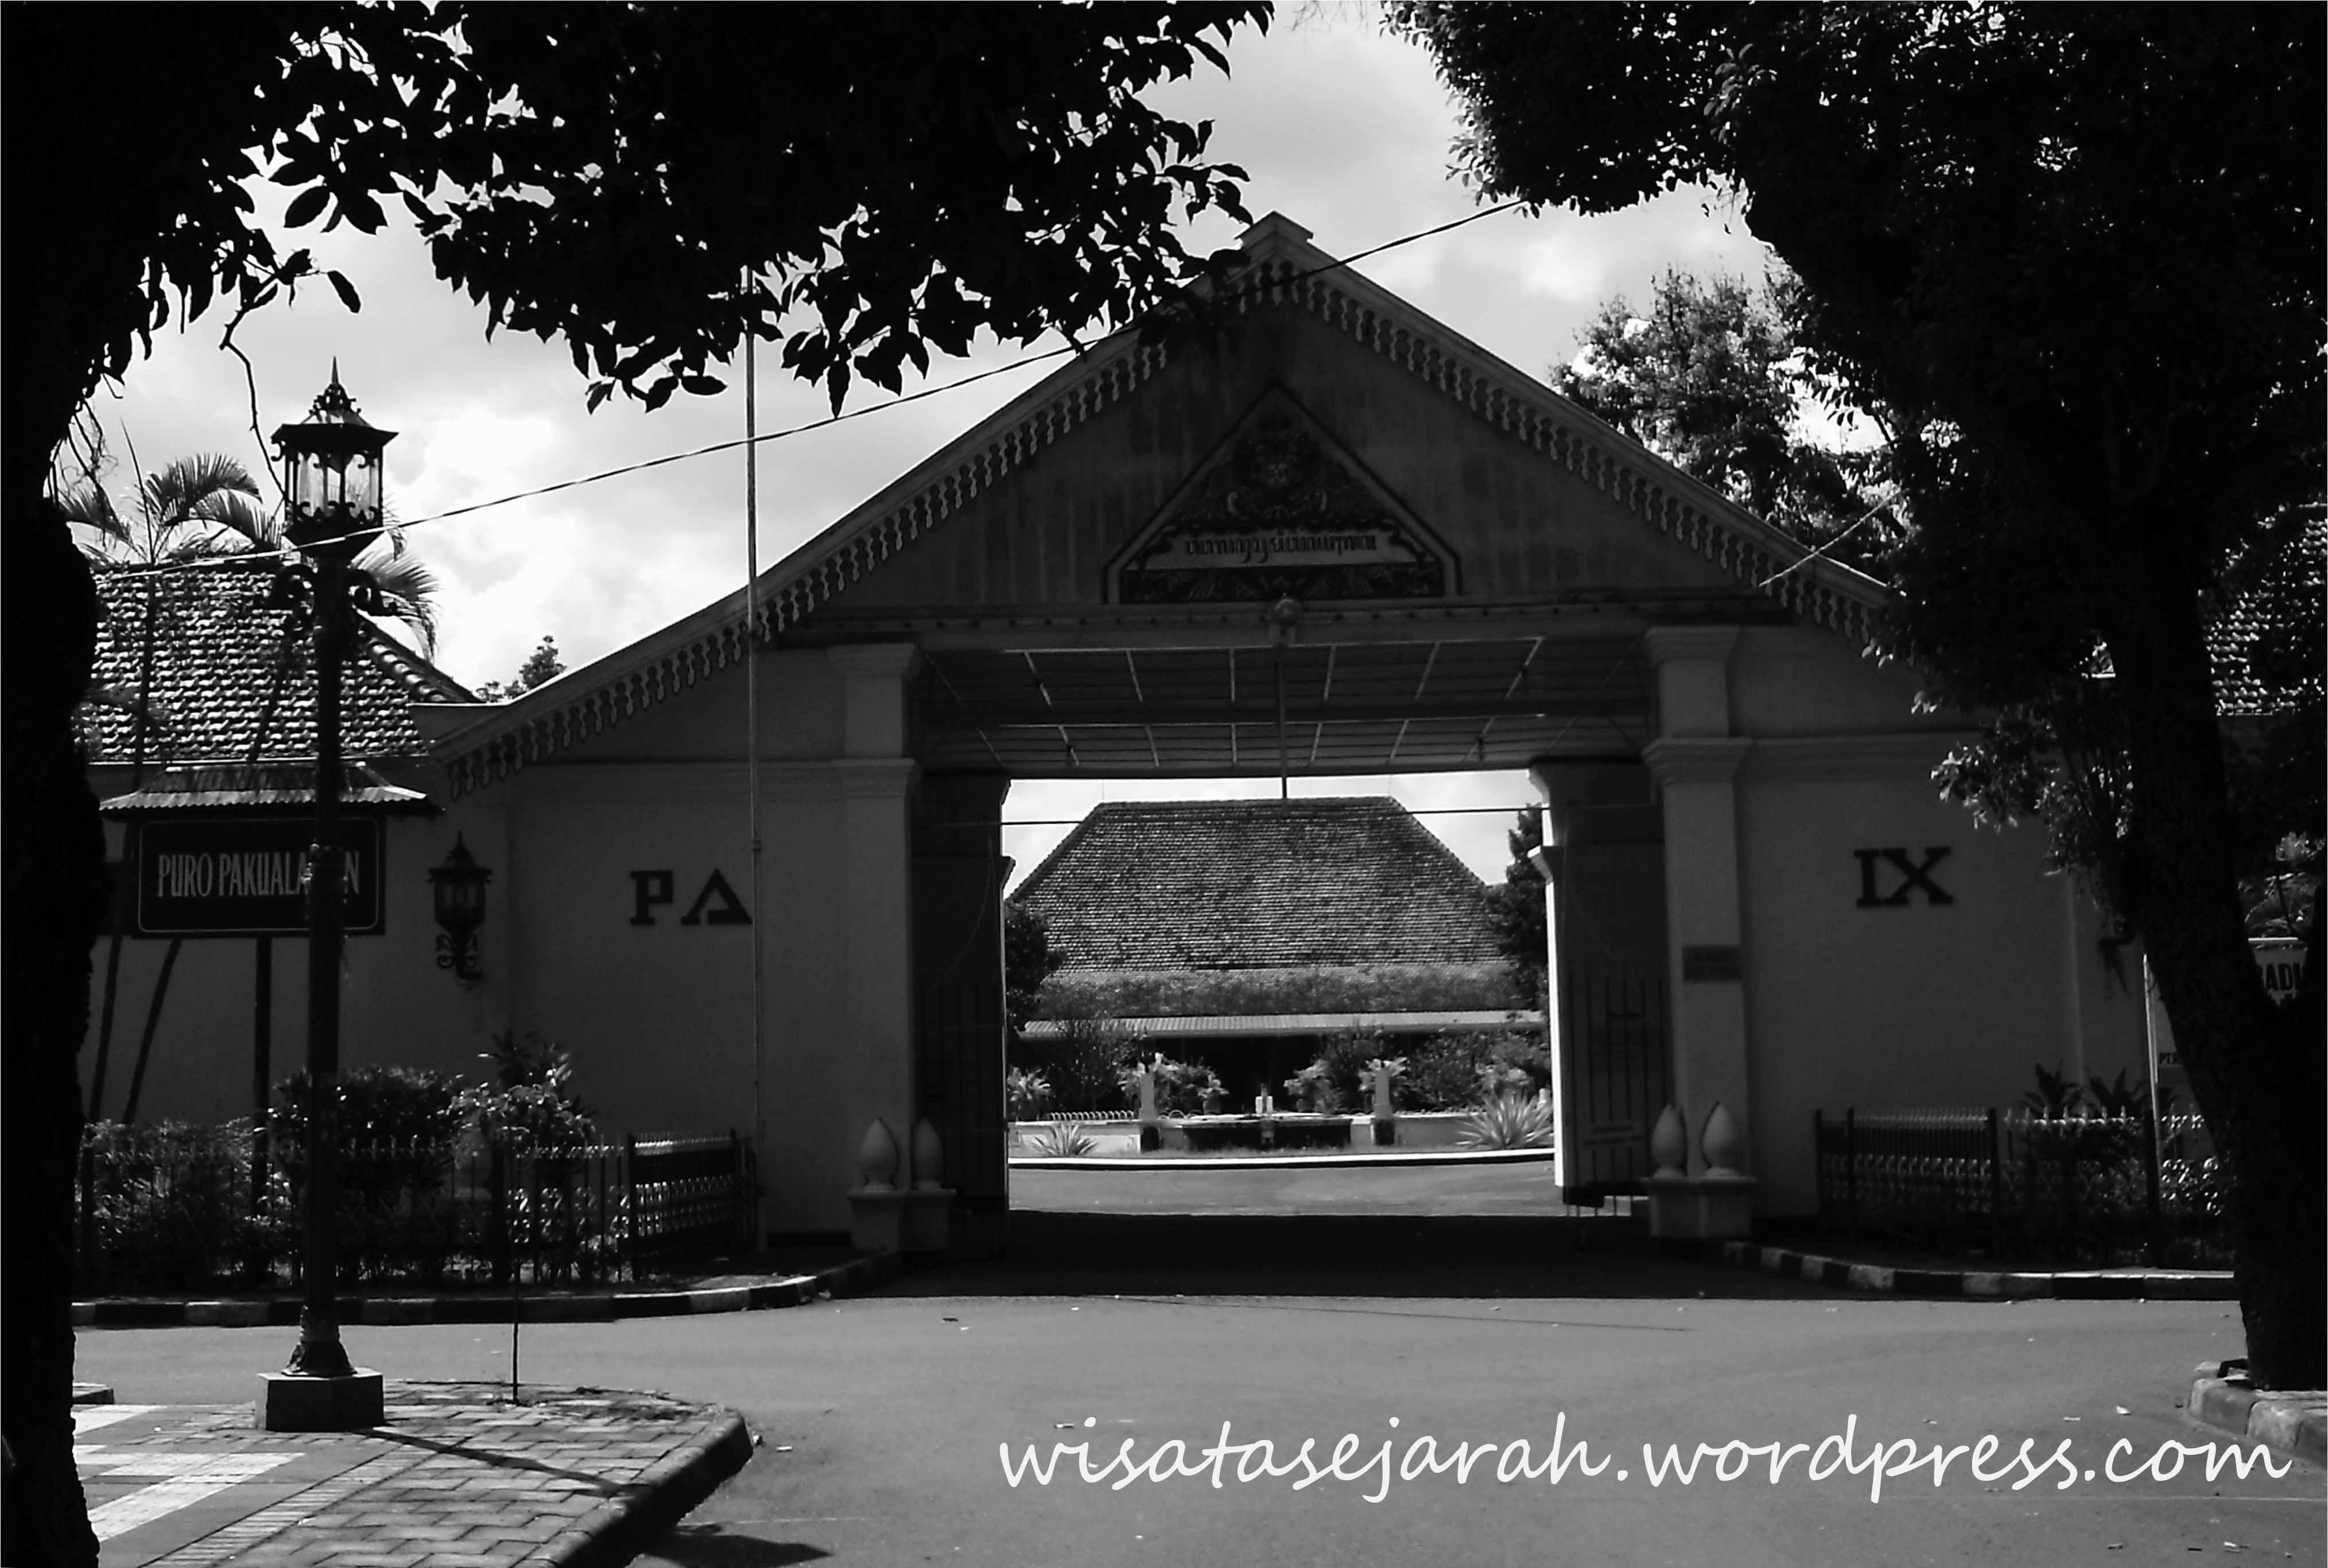 Wisata Sejarah Masjid Gede Museum Kh Ahmad Dahlan Puro Pakualaman